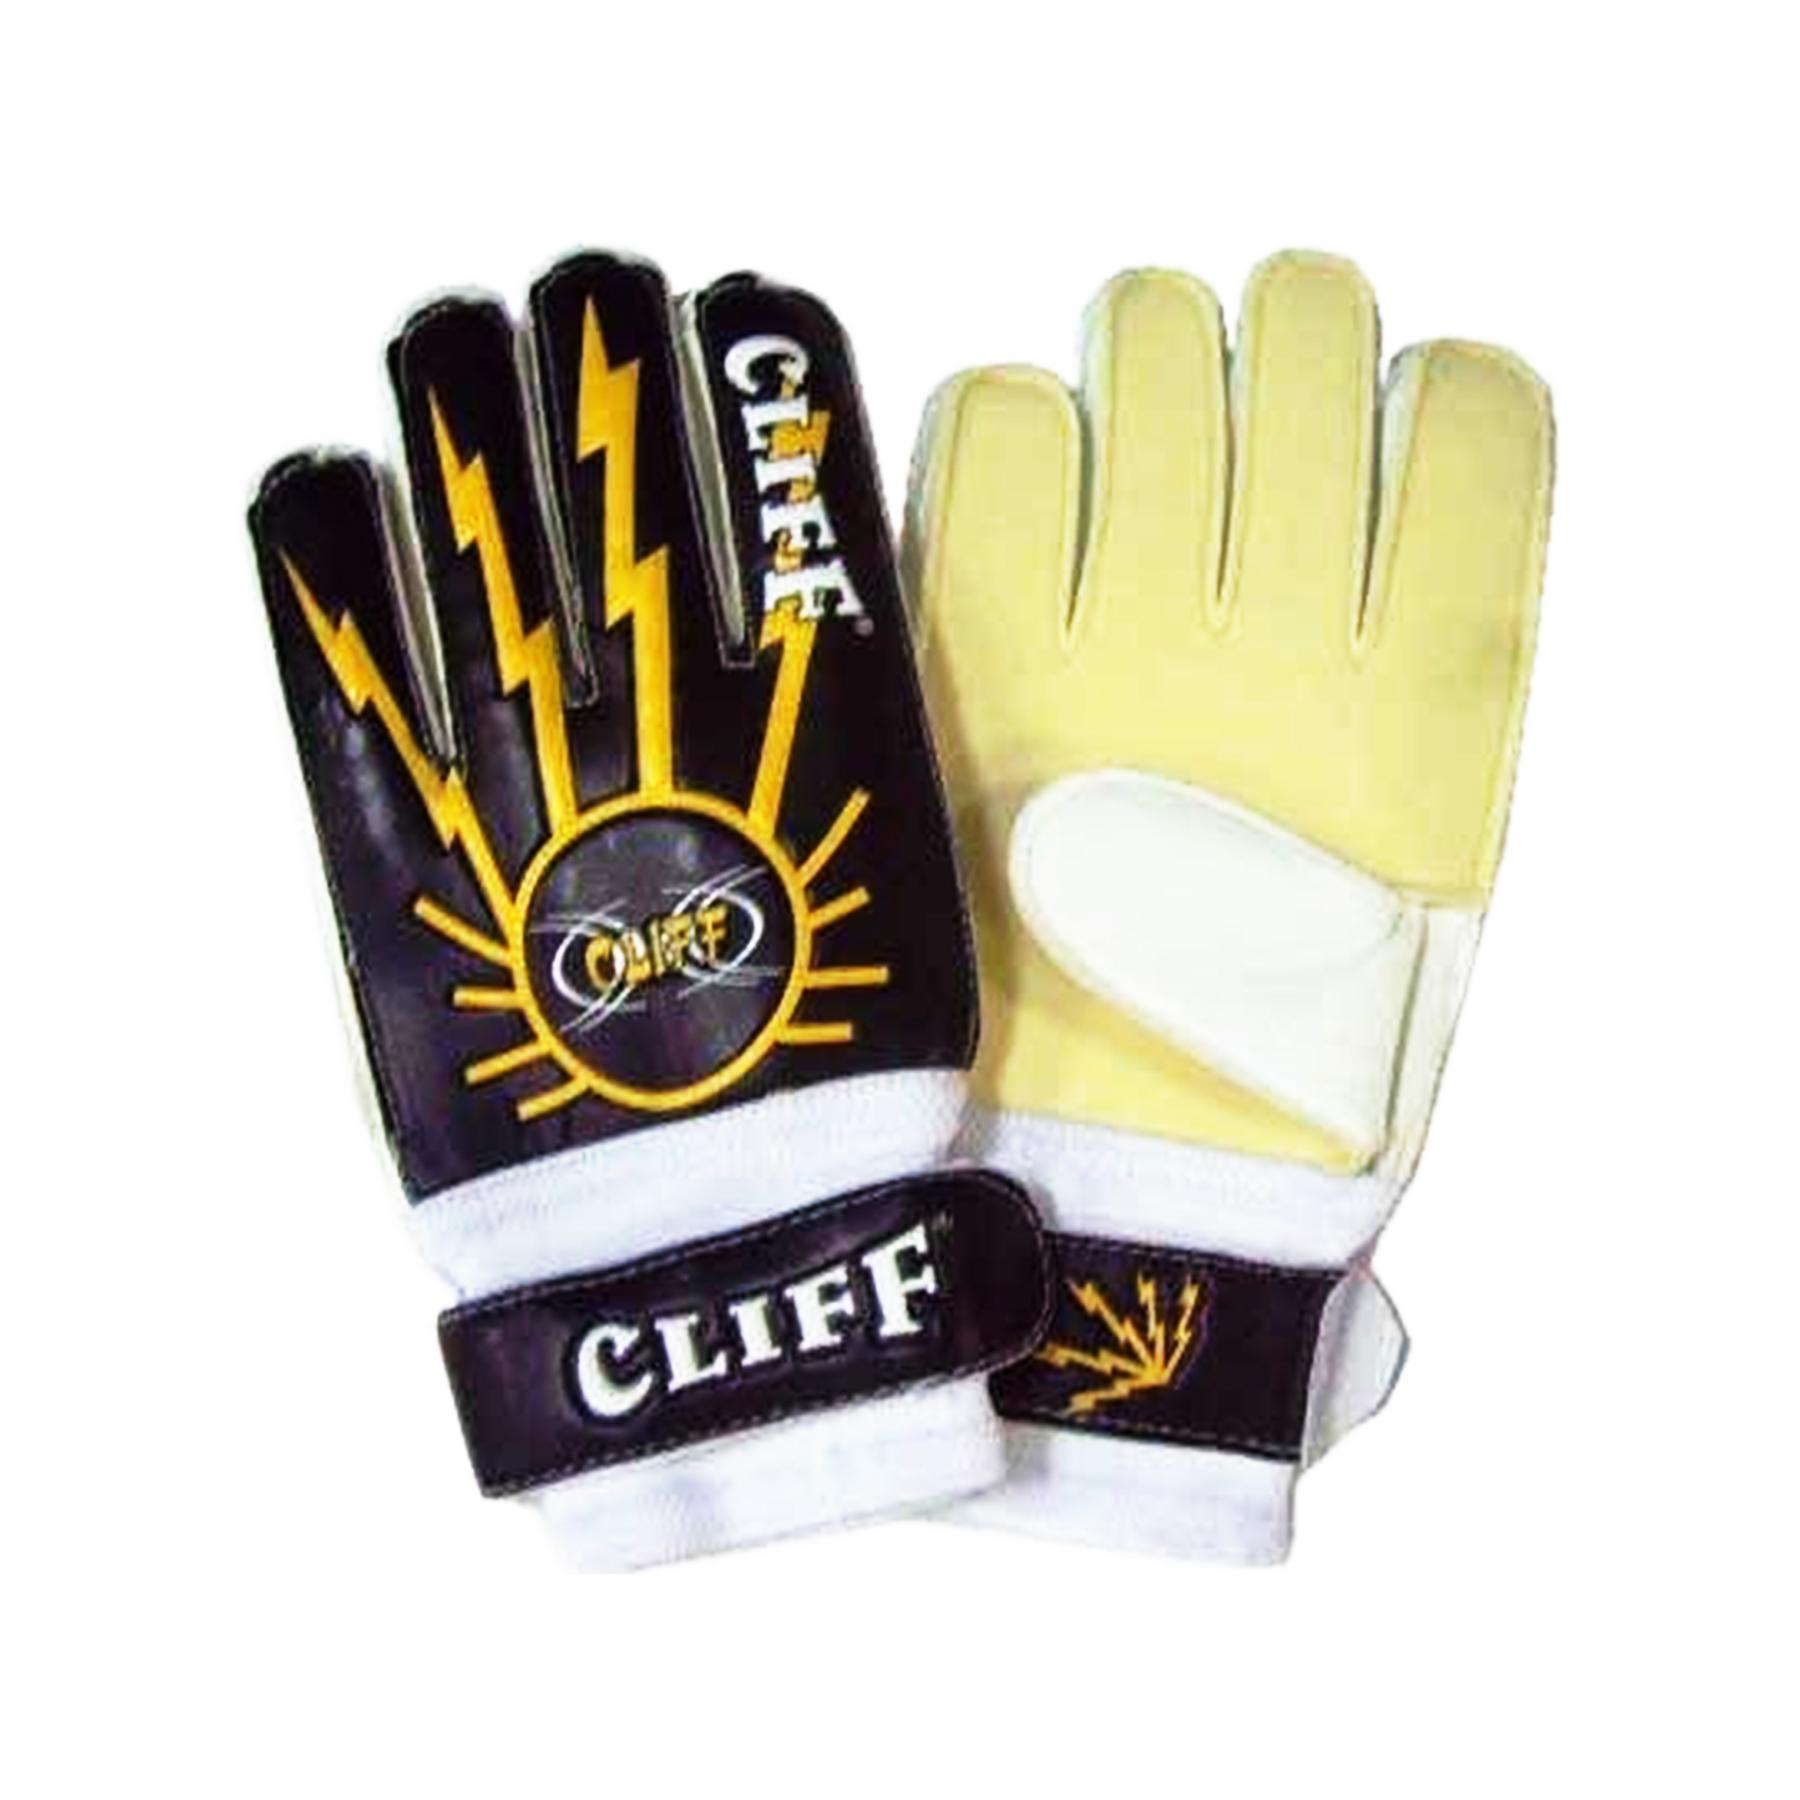 Перчатки вратарские CLIFF Stick (латекс/ПУ)  р. 10/L